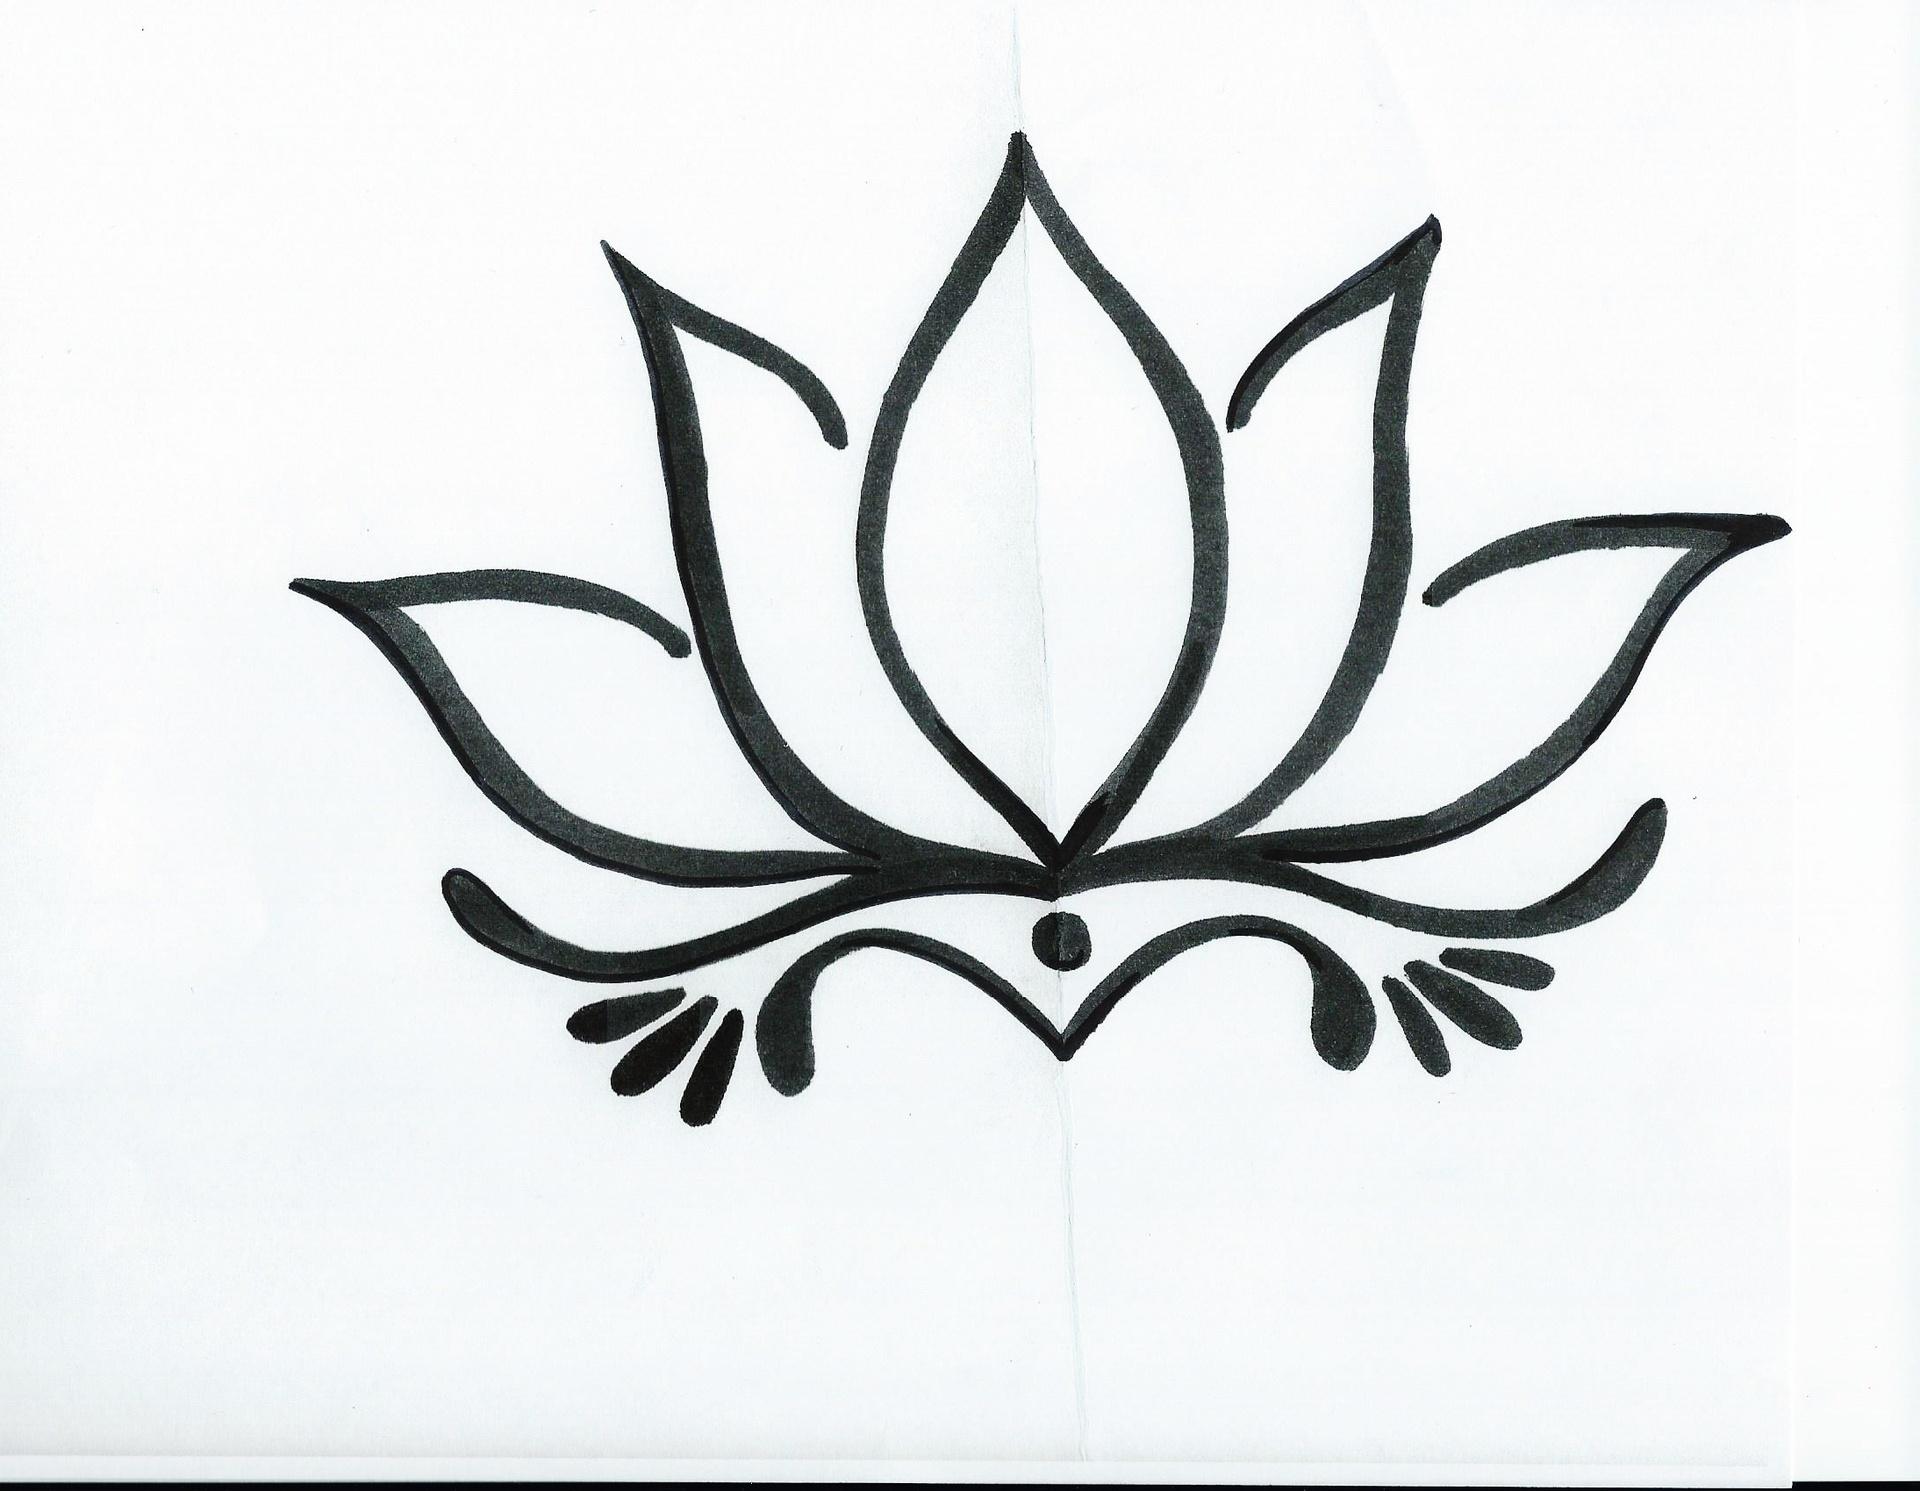 Tattoo design drawing at getdrawings free for personal use 1920x1491 download tattoo design drawing simple izmirmasajfo